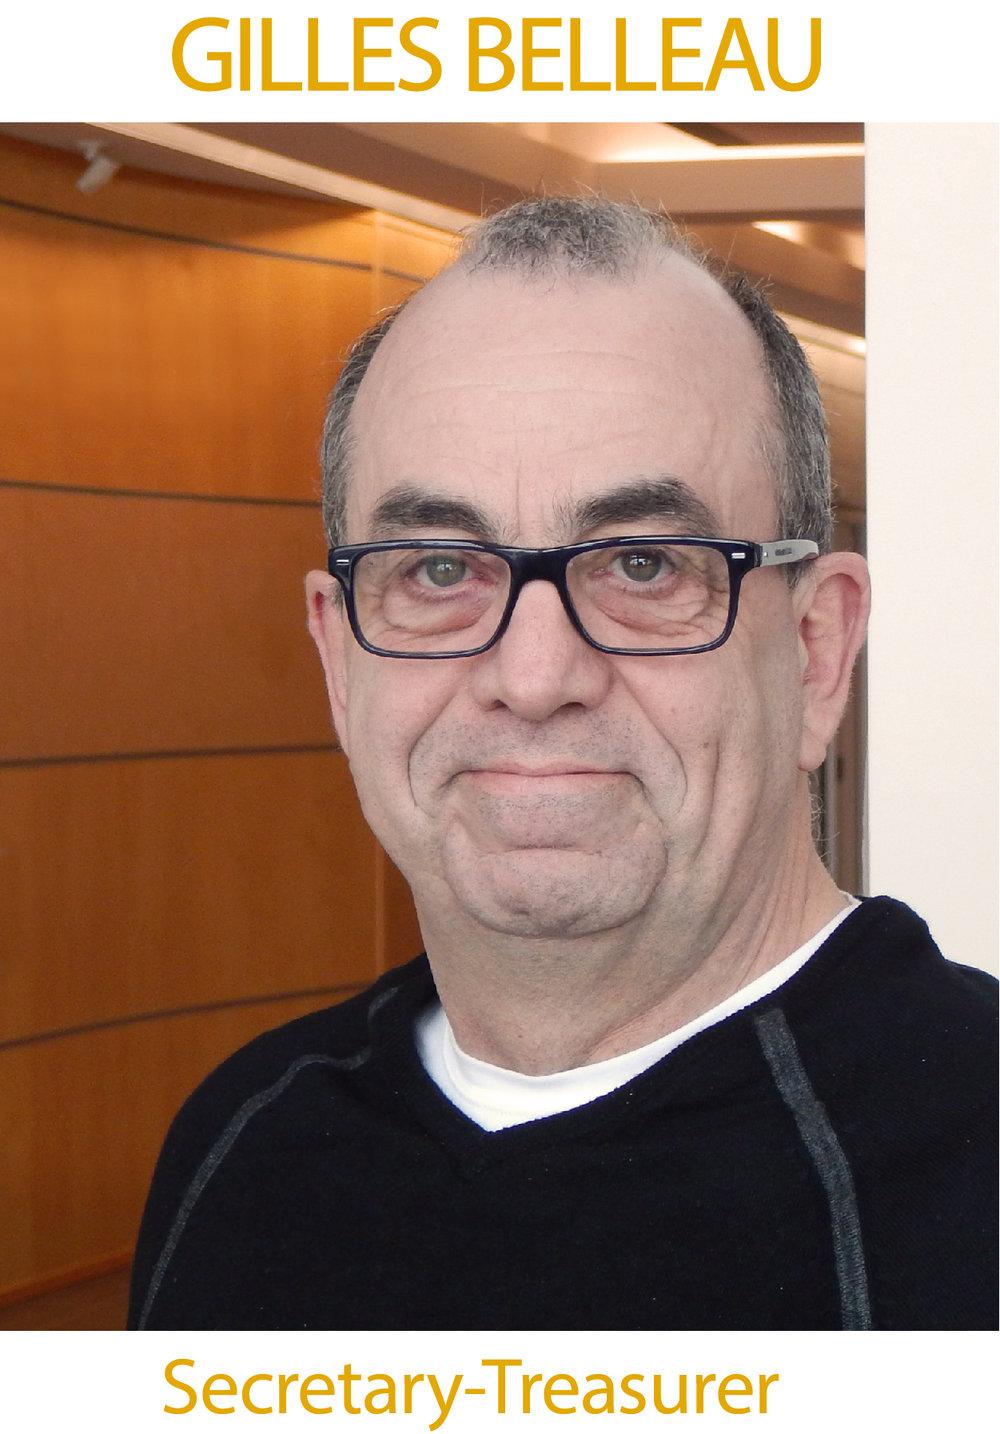 Gilles Belleau